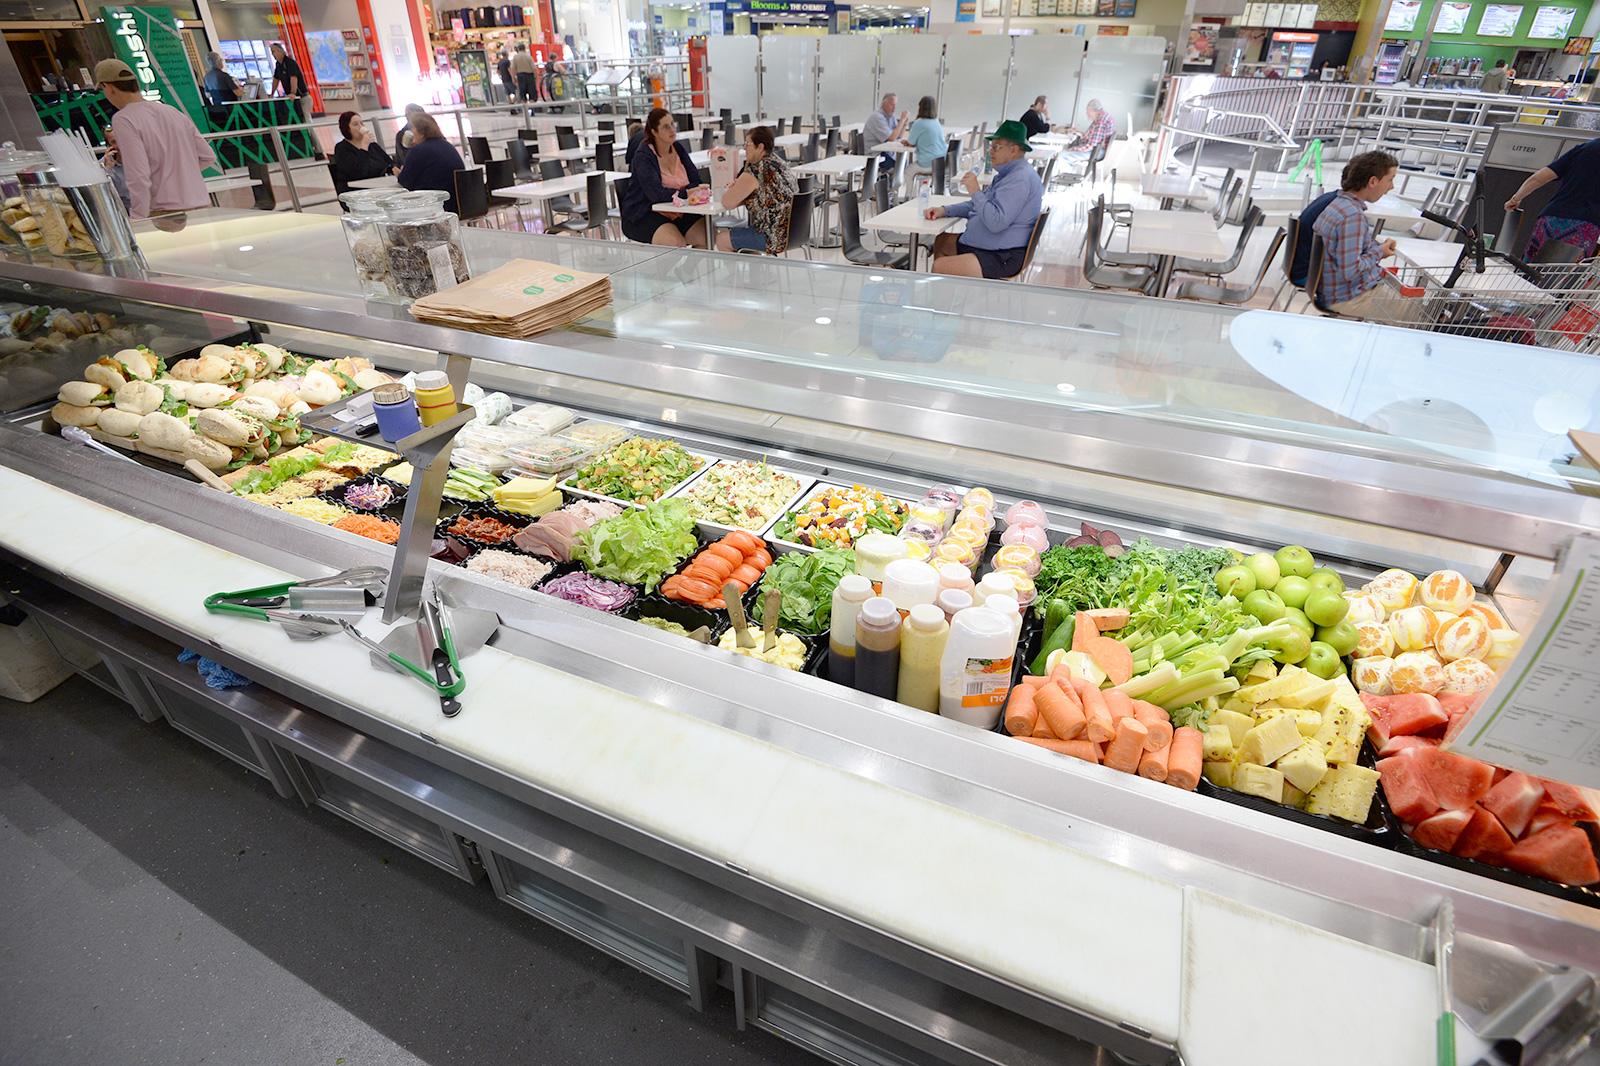 takeaway-sandwich-shop-healthy-habits-grafton-shopping-world-reduced-price-1